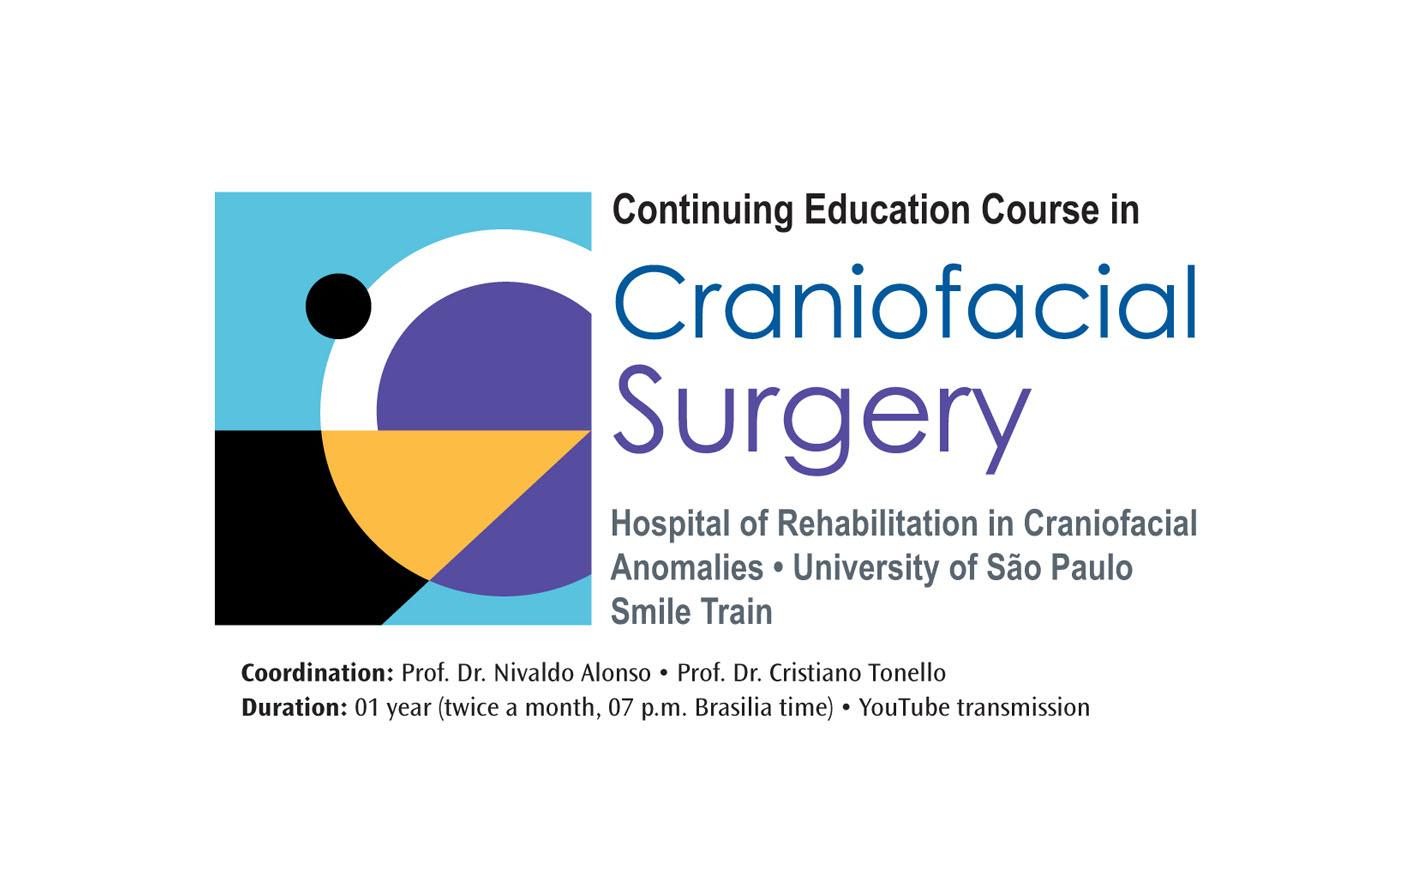 HRAC-USP e Smile Train promovem curso a distância de cirurgia craniofacial